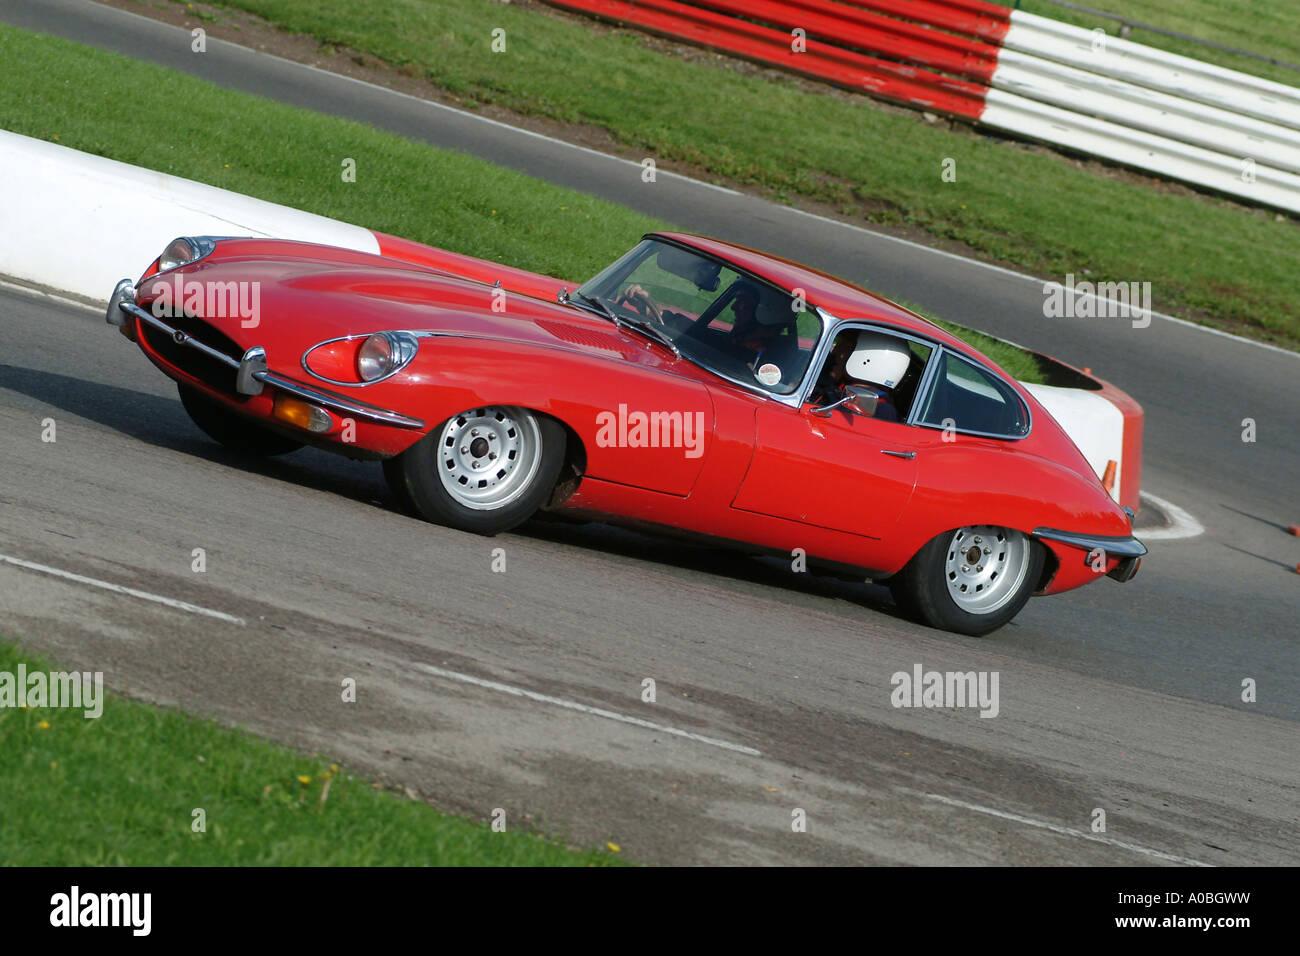 Jaguar driving gloves uk - Red Jaguar E Type Classic Sports Car On Race Track In The Uk Stock Image